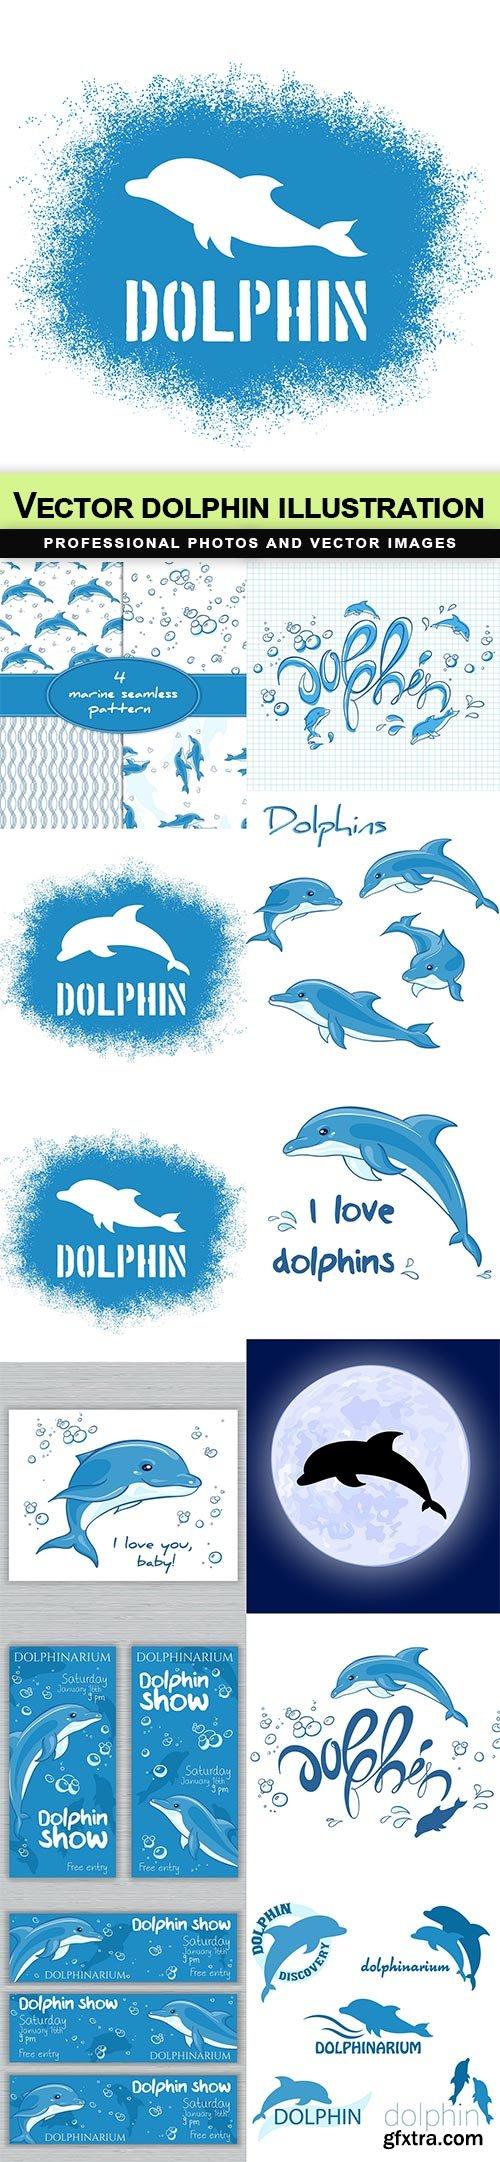 Vector dolphin illustration